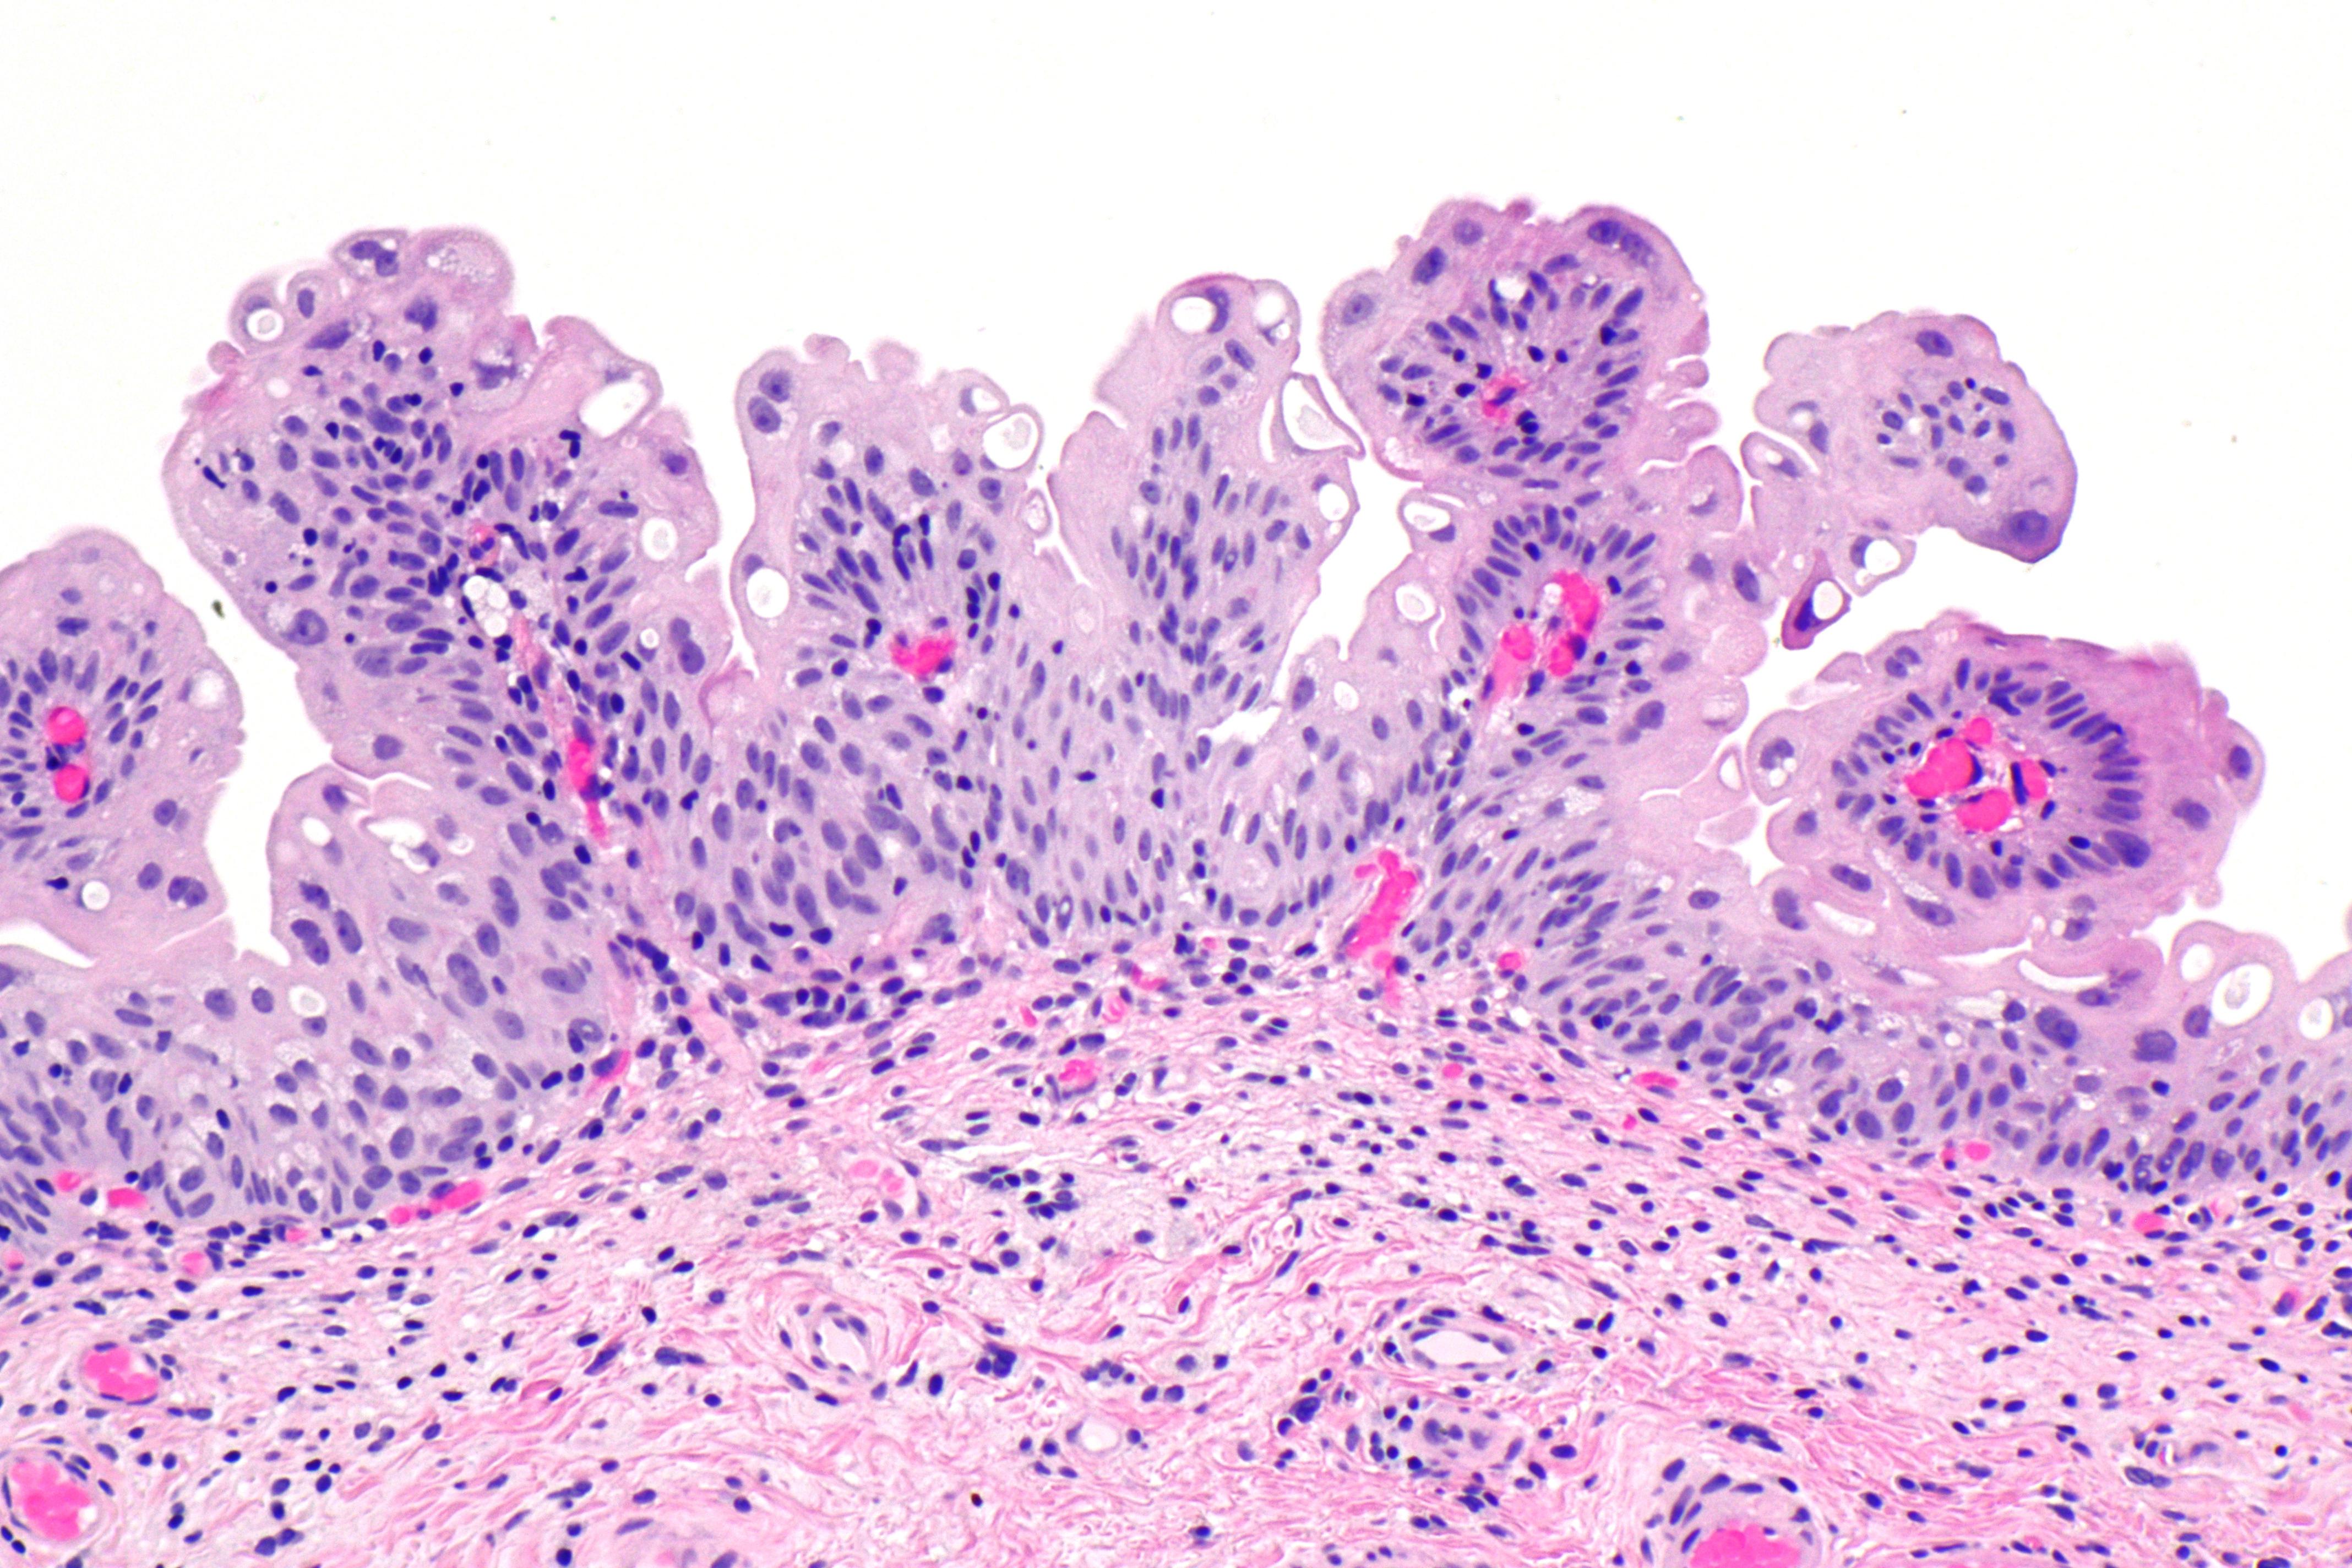 urothelial papilloma follow up